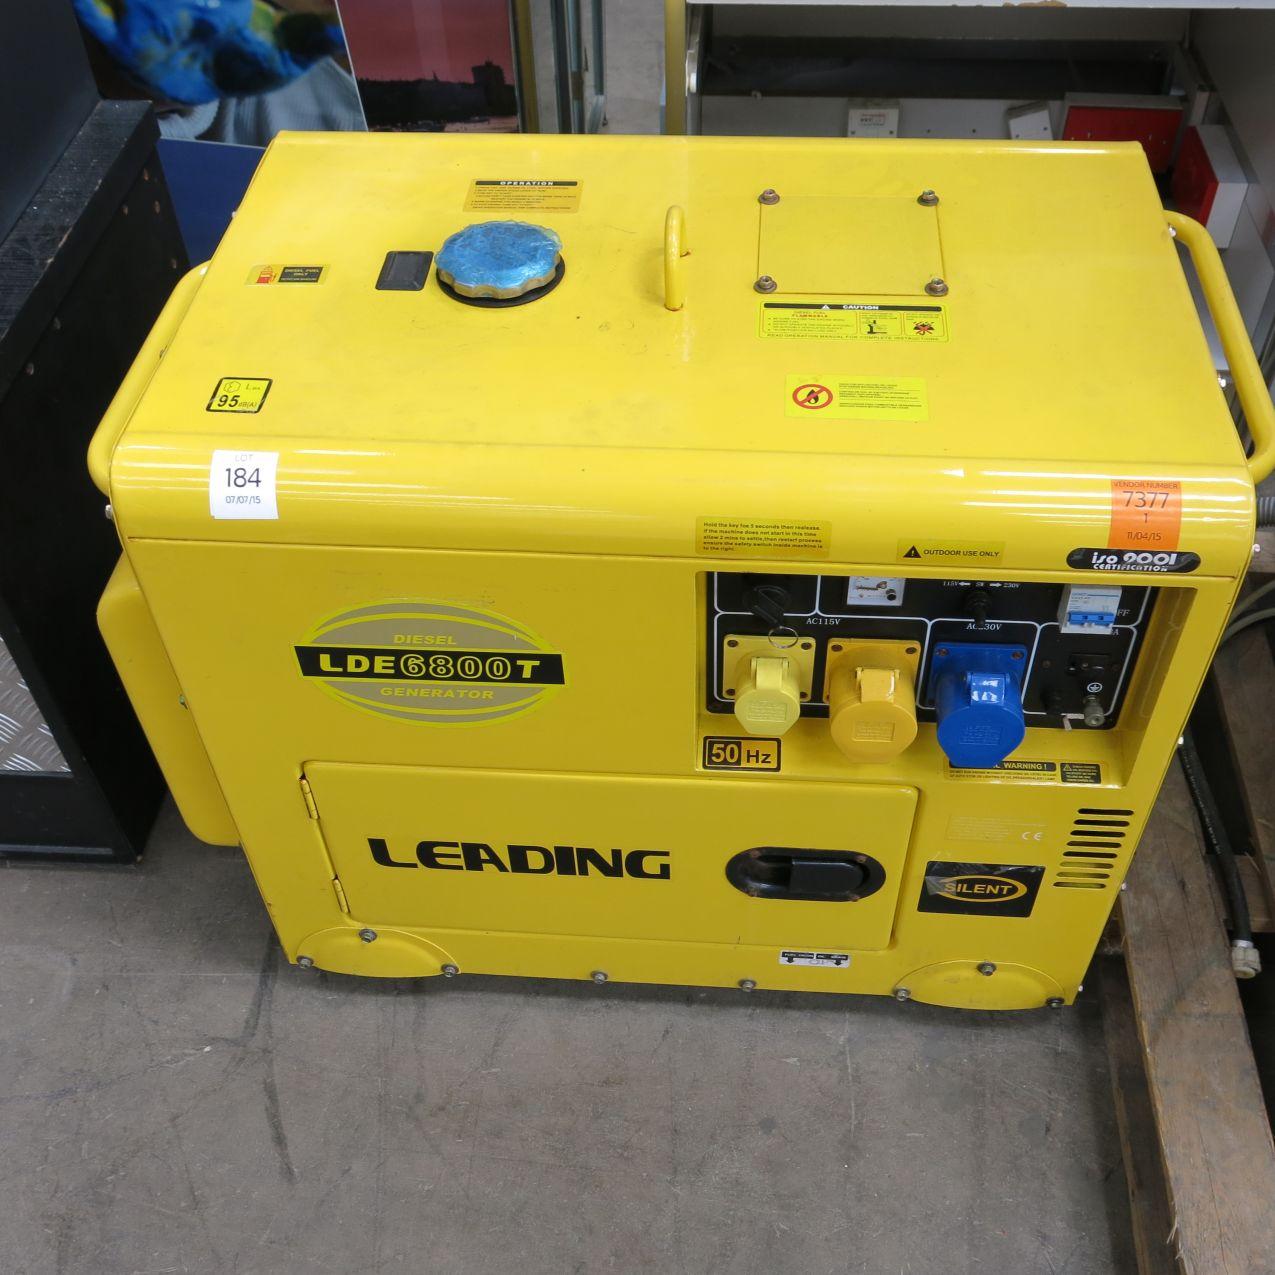 Lot 184 - A leading diesel LDE6800T generator, rated power 4.5-5 KVA,